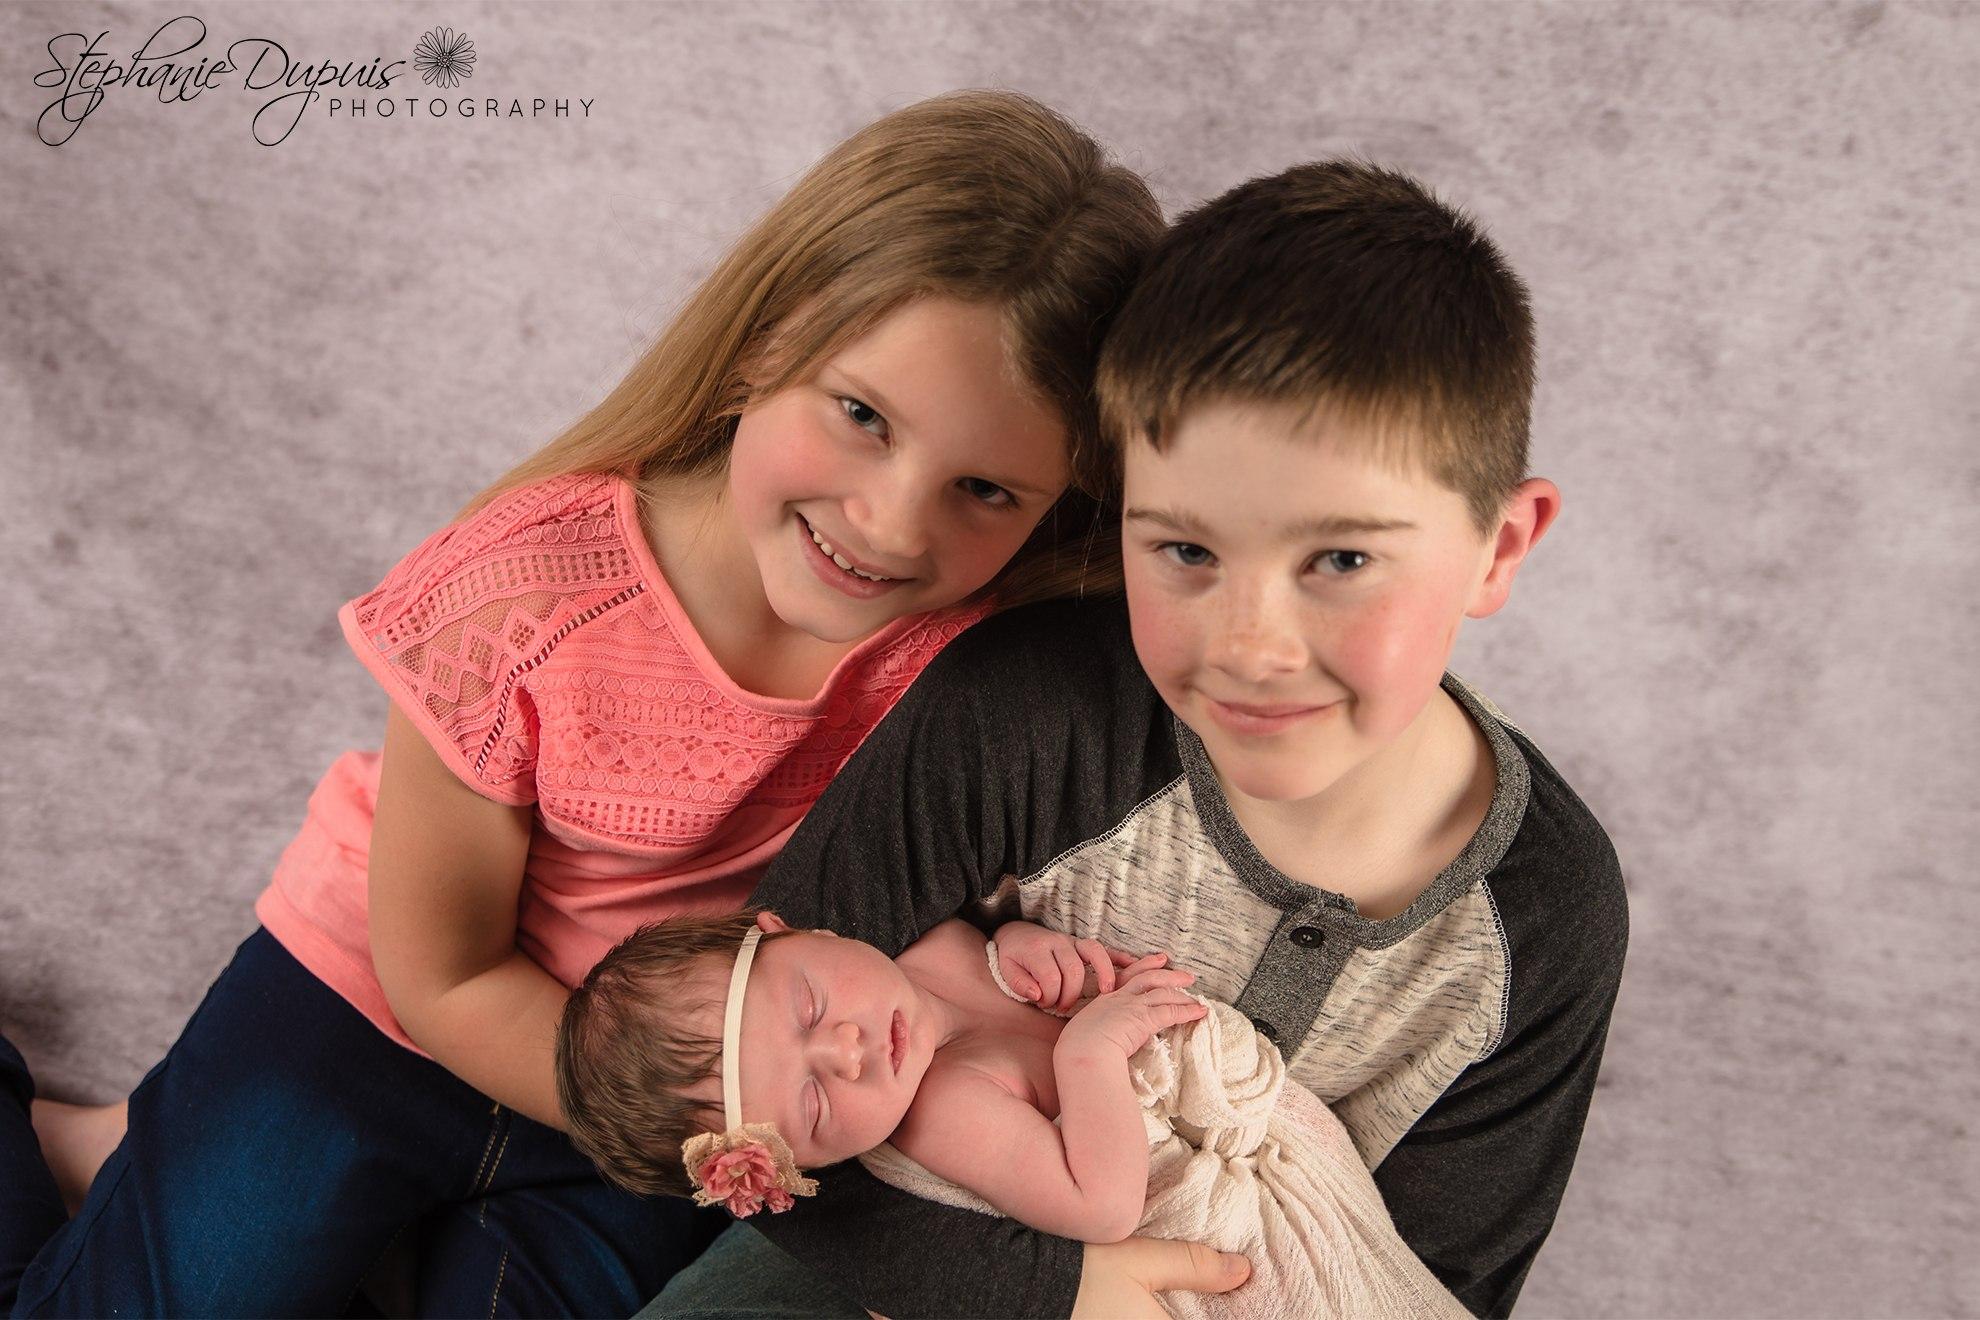 Trisha Eckherdt Infant 1007 - Portfolio: Rayia - Infant Session